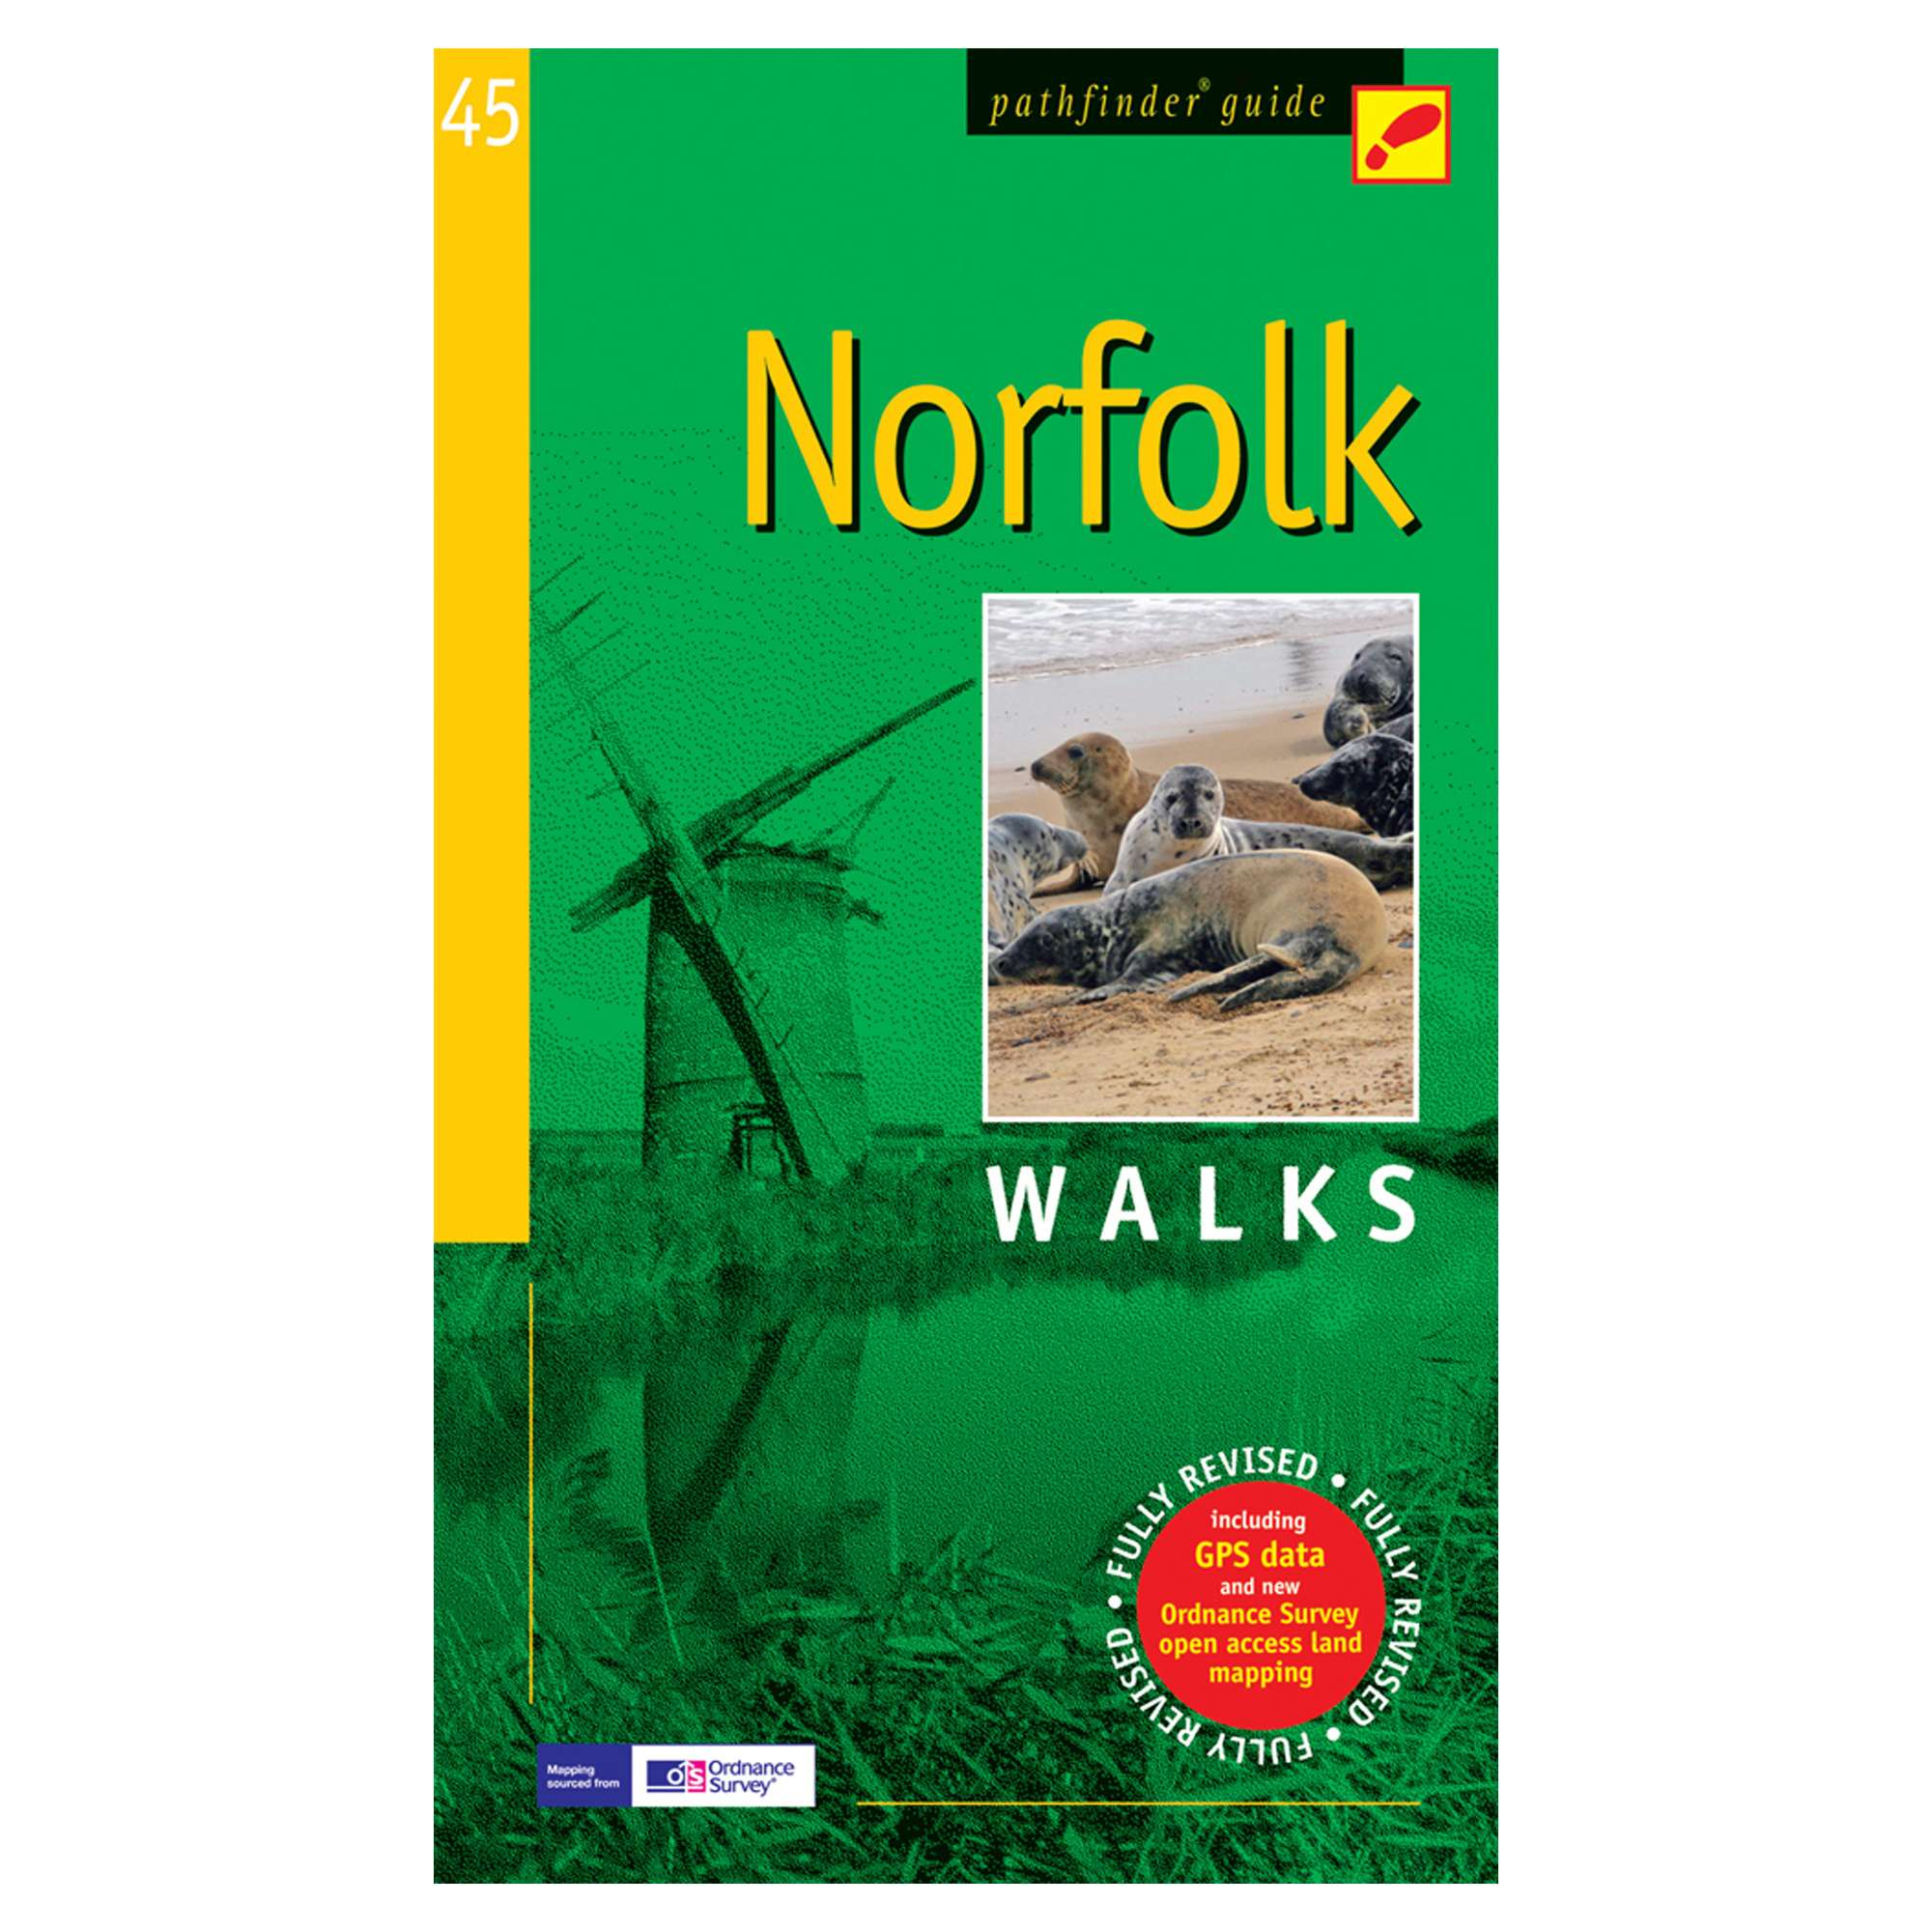 PATHFINDER Norfolk Walks Guide